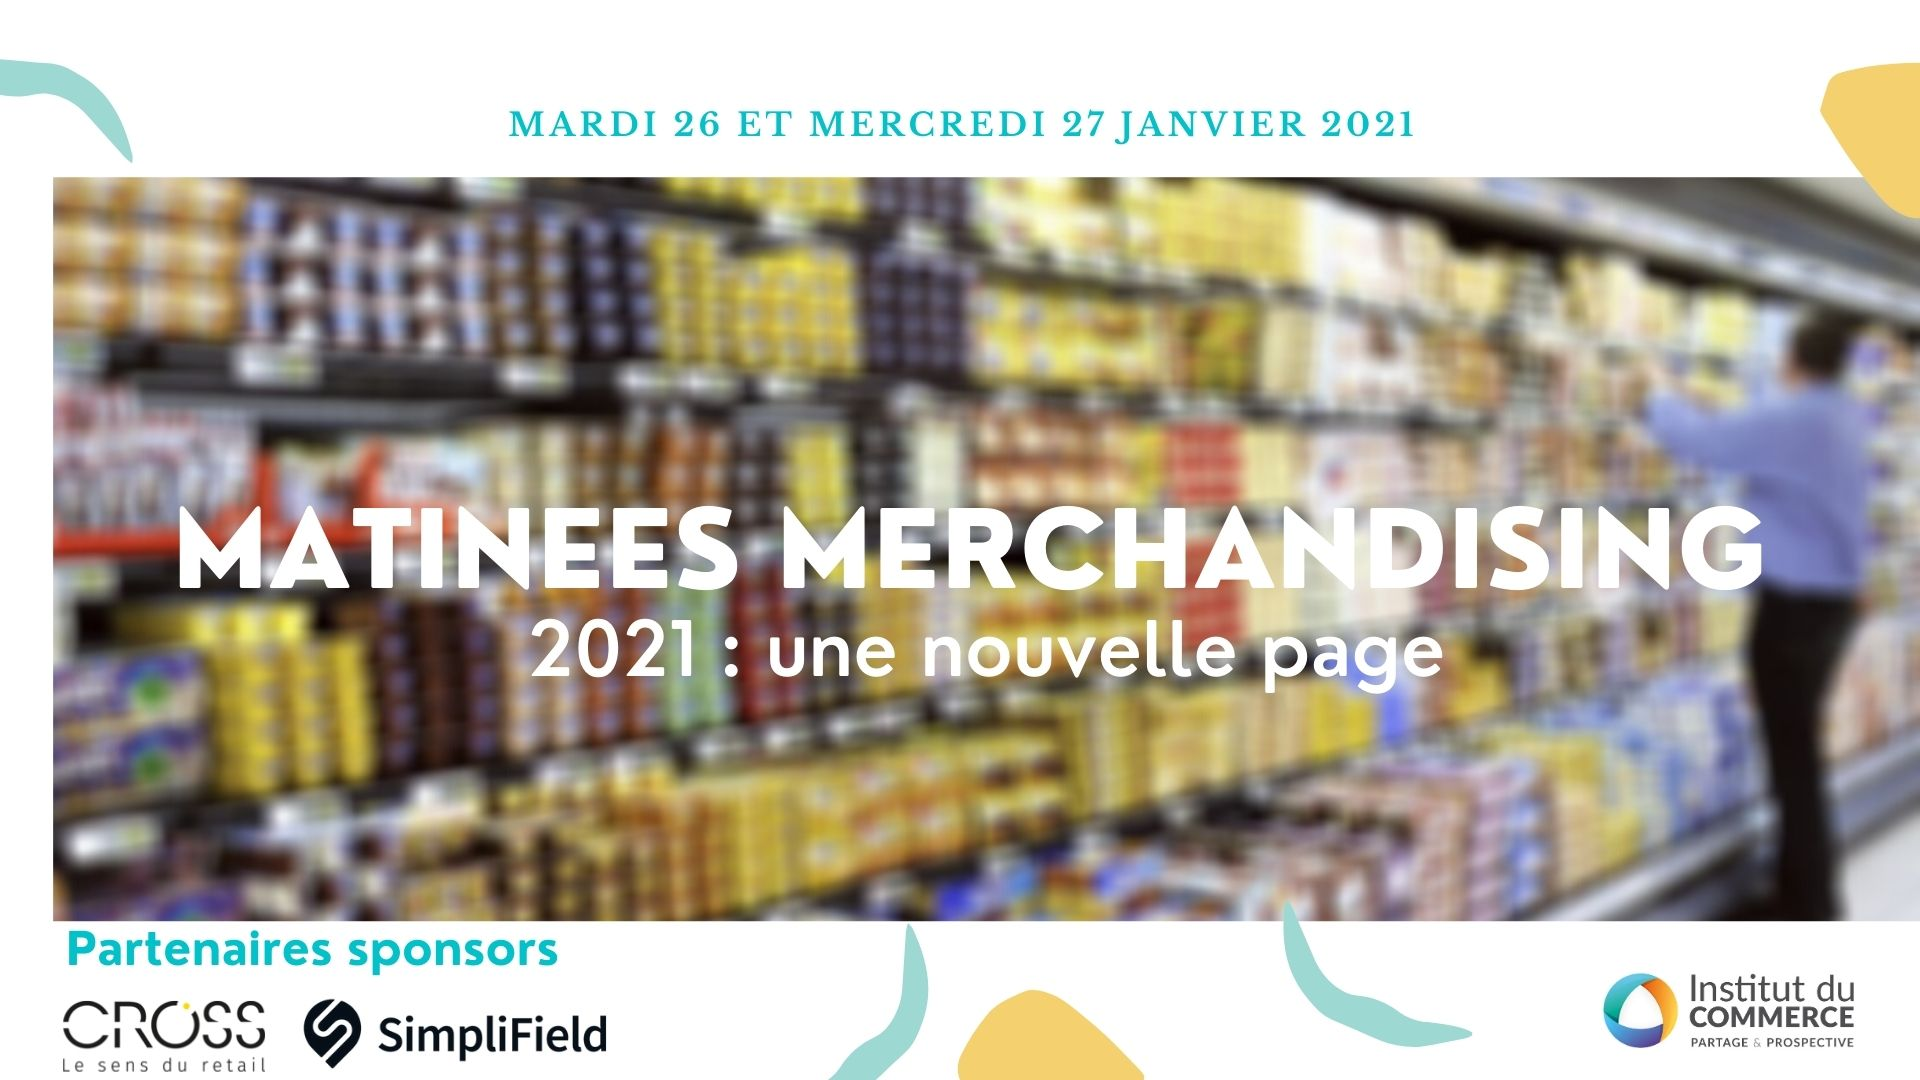 Merchandising 2021 : une nouvelle page